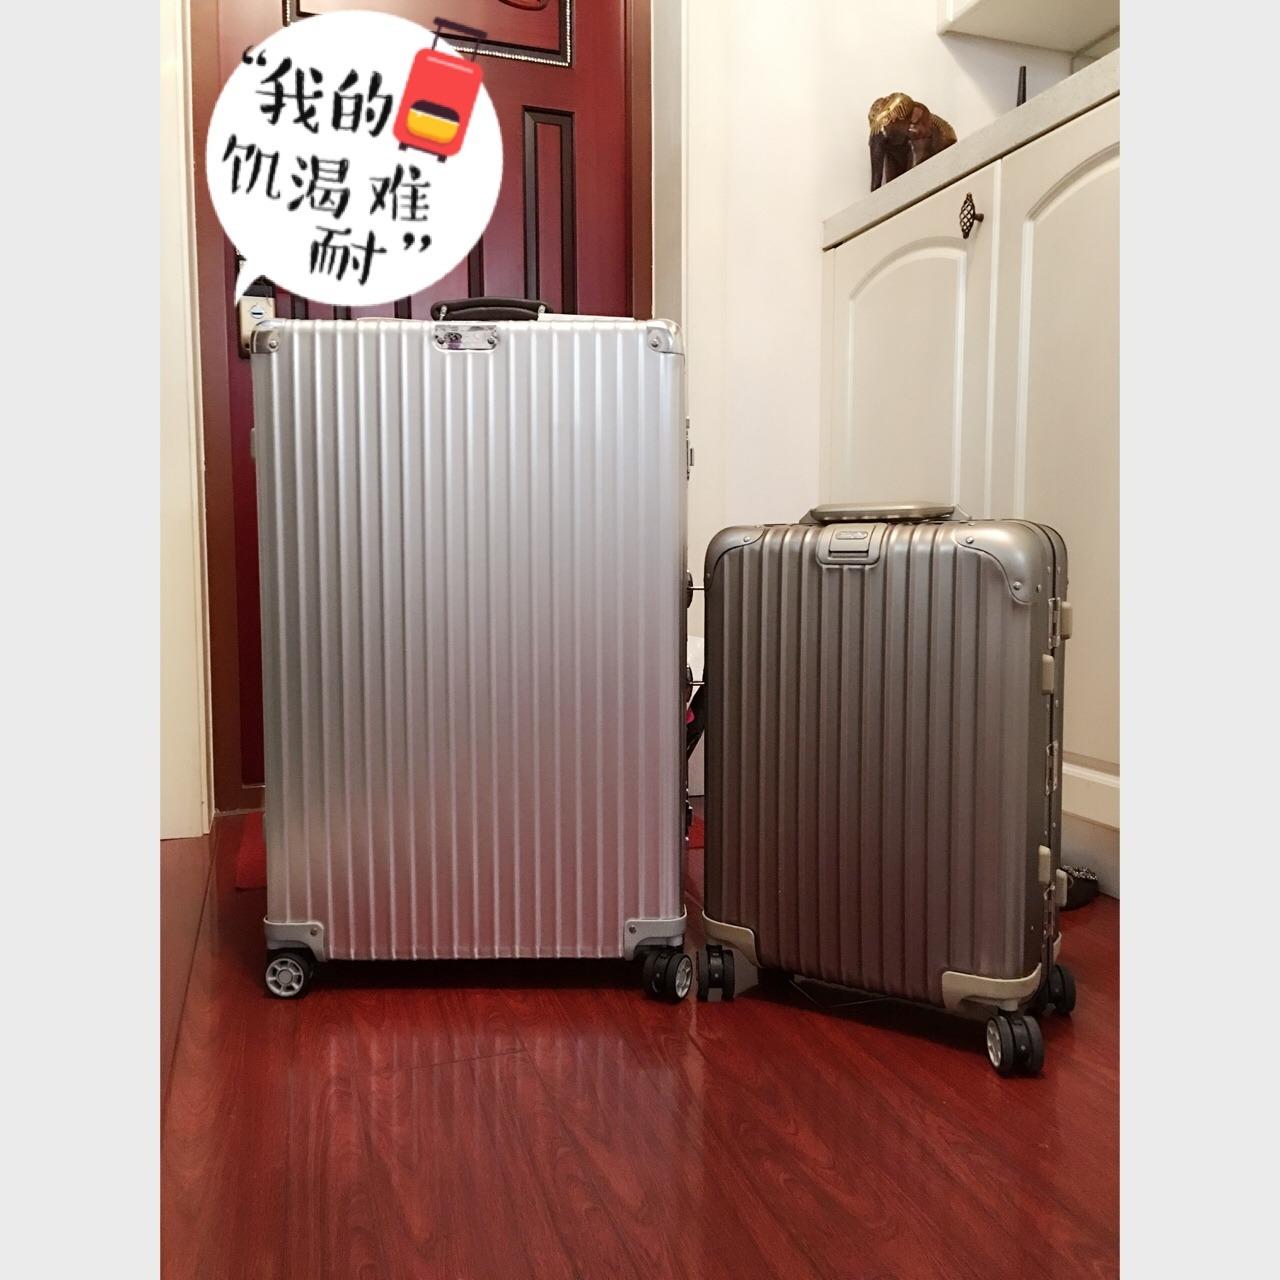 rimowa旅行箱7615是长途旅行必备的